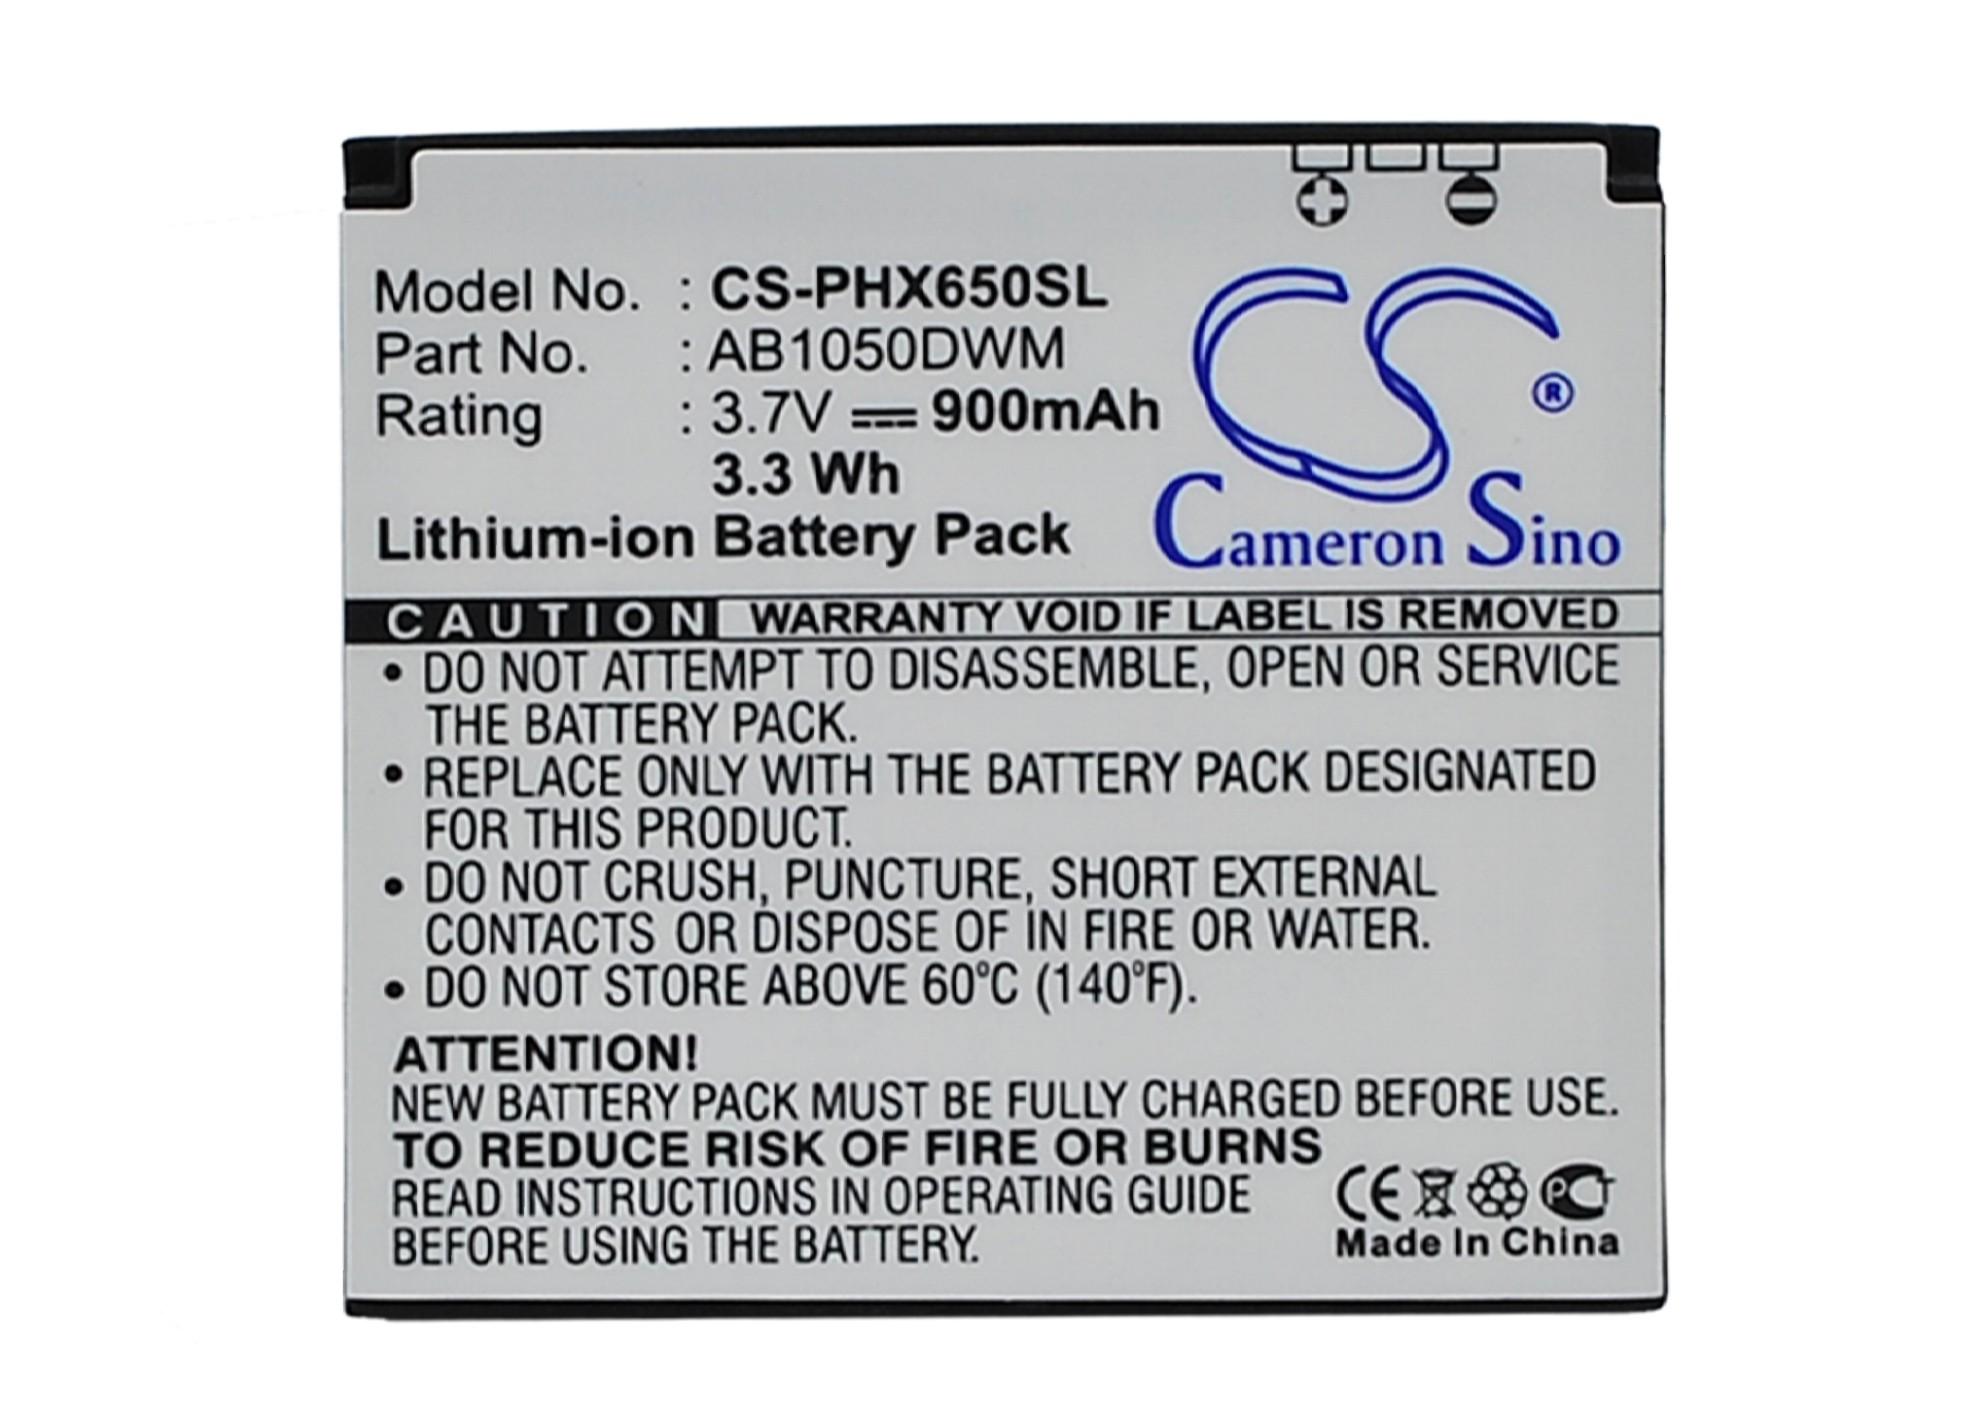 Cameron Sino baterie do mobilů pro PHILIPS Xenium X605 3.7V Li-ion 900mAh černá - neoriginální